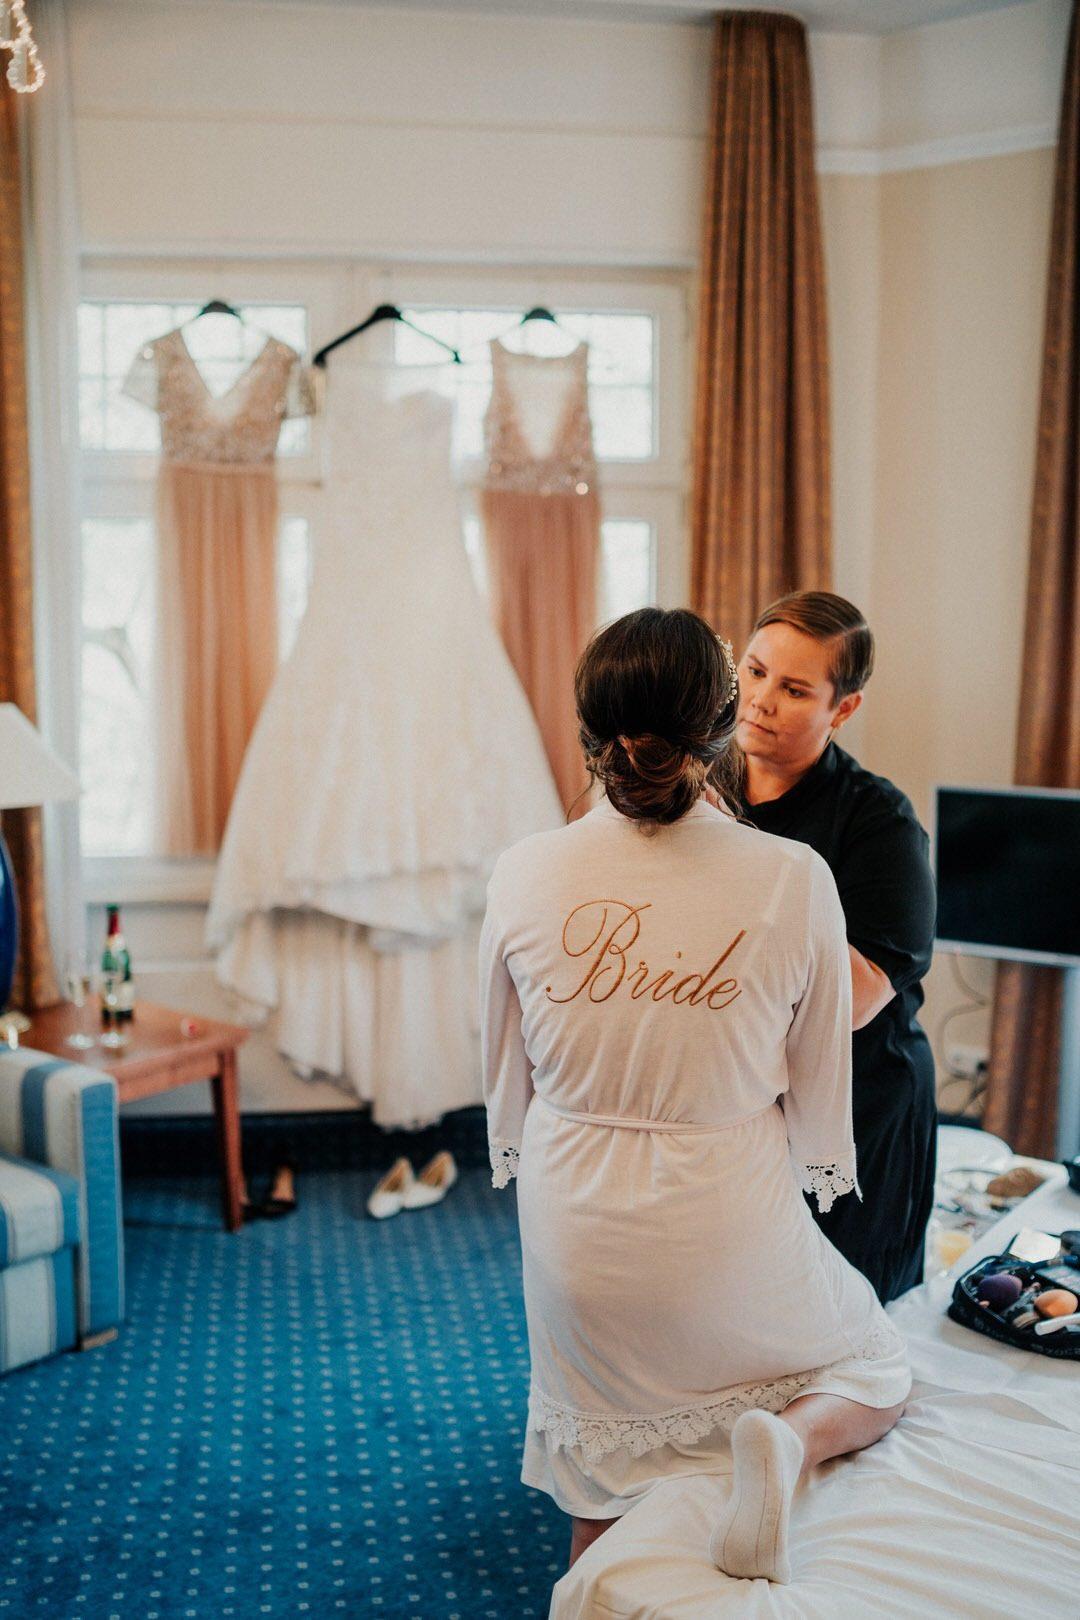 Braut im Getting Ready Outfit im Hotel in Wiesbaden